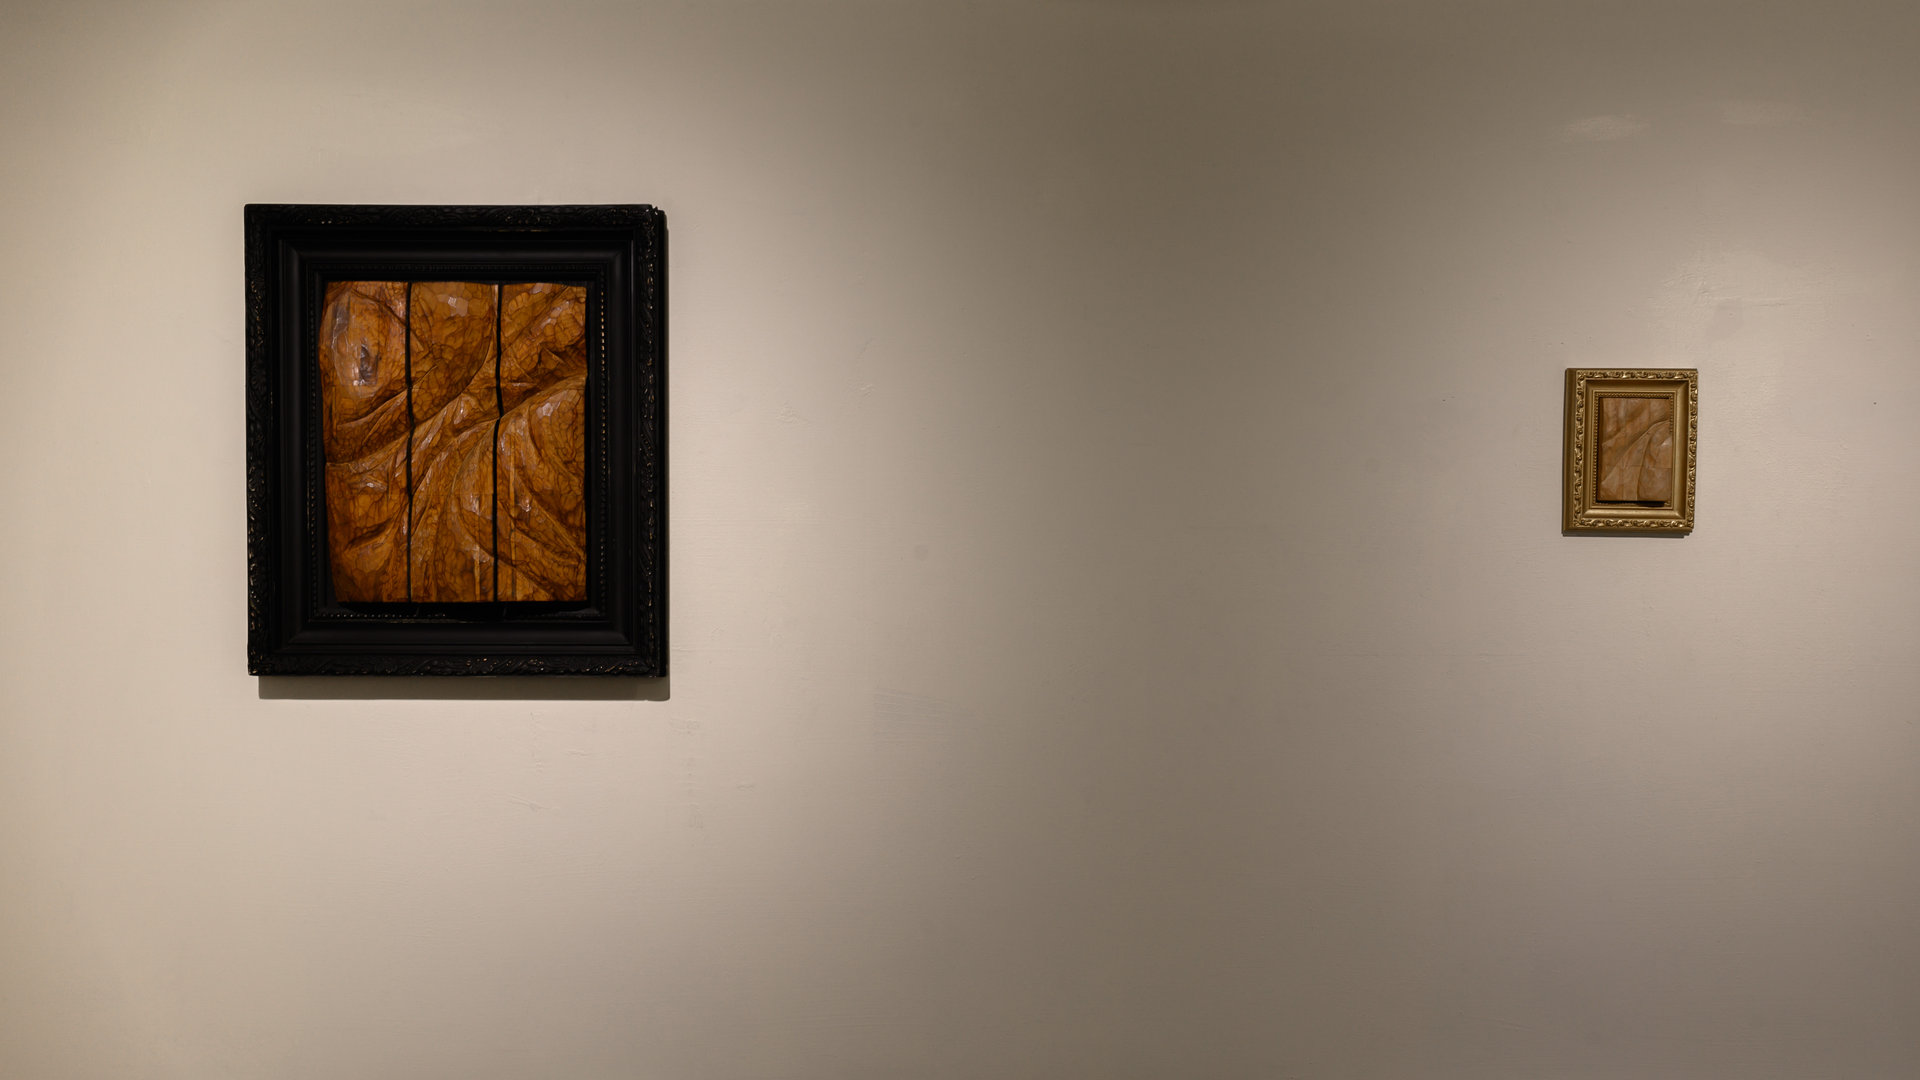 ART_8050.jpg